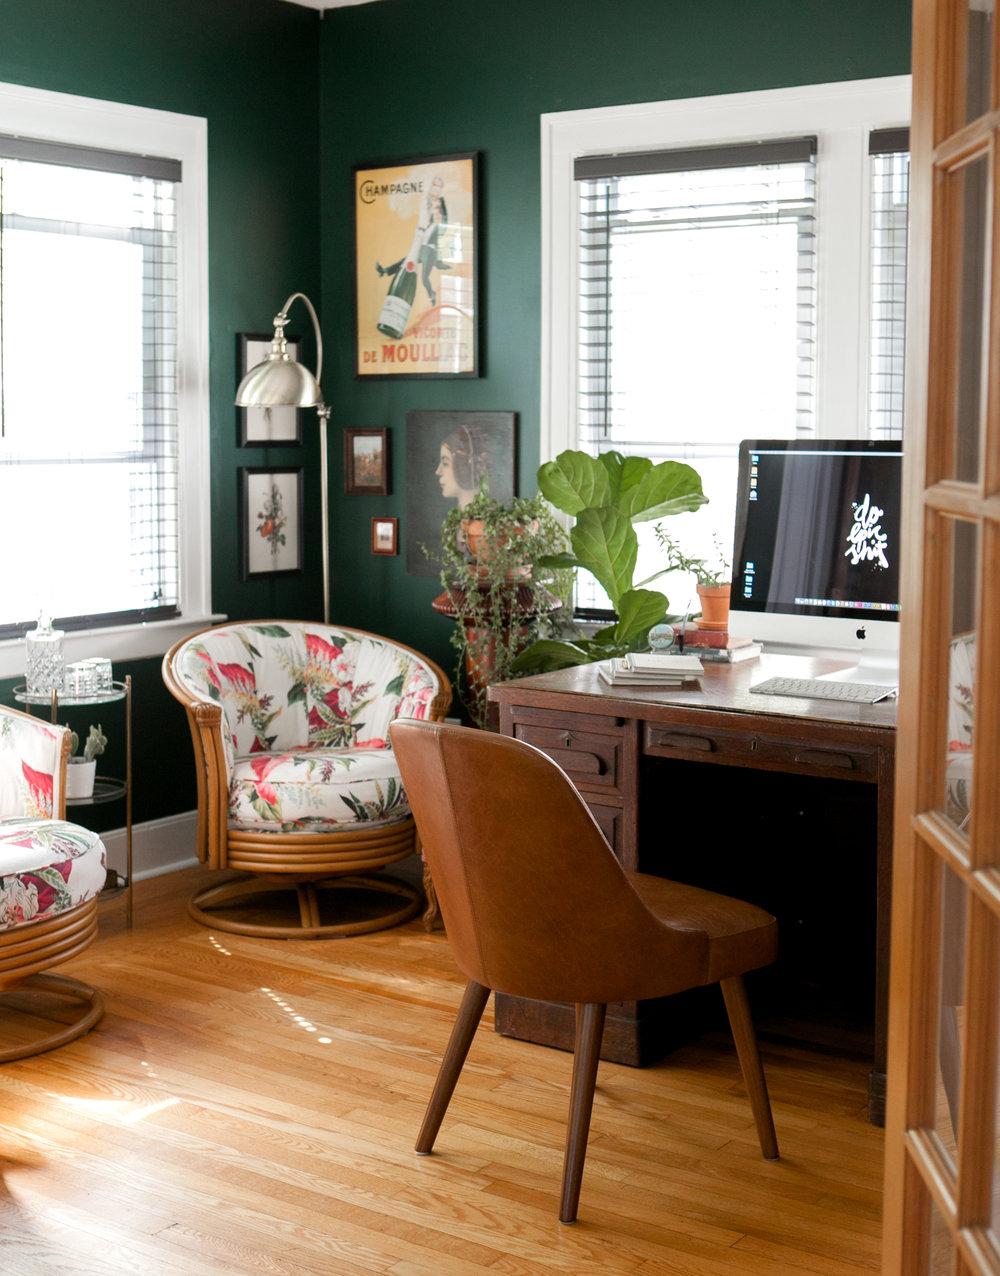 02_Design-Sponge-Jessica-Brigham-Office.jpg